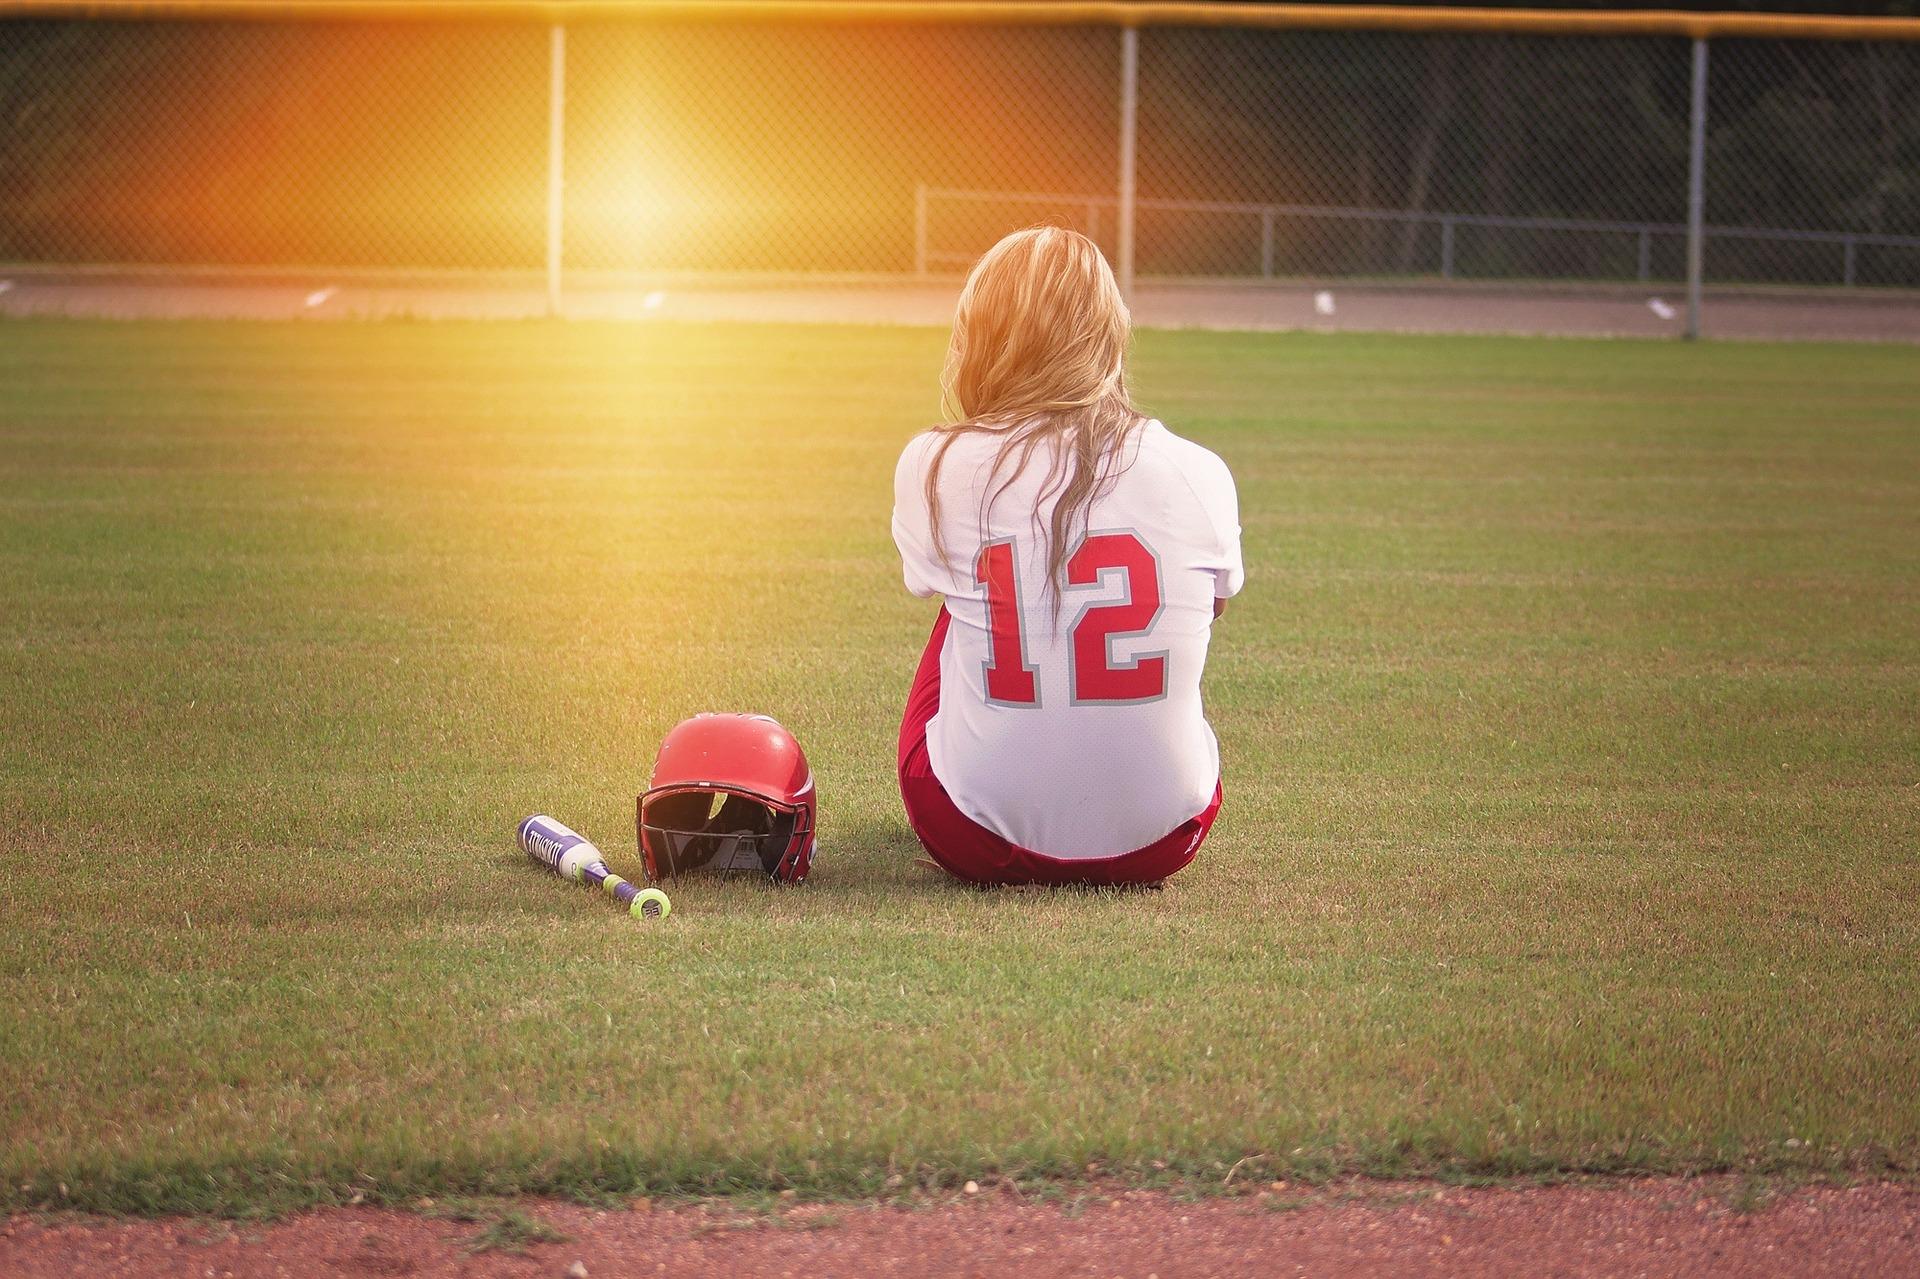 softball-1534446_1920.jpg